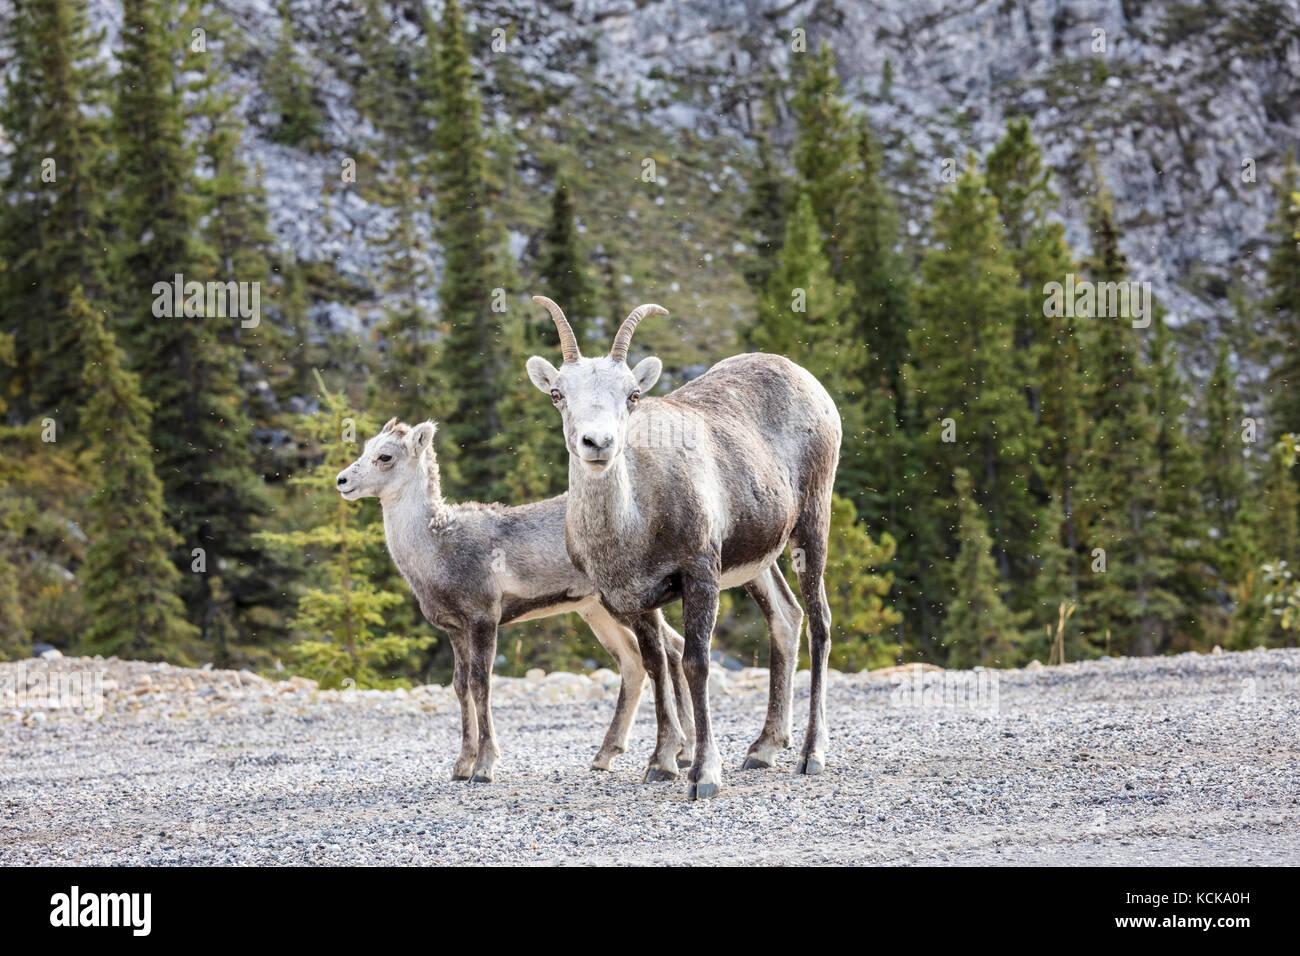 Stone Sheep  (Ovis dalli stonei)  ewe and lamb, Stone Mountain Provincial Park, British Columbia, Canada - Stock Image